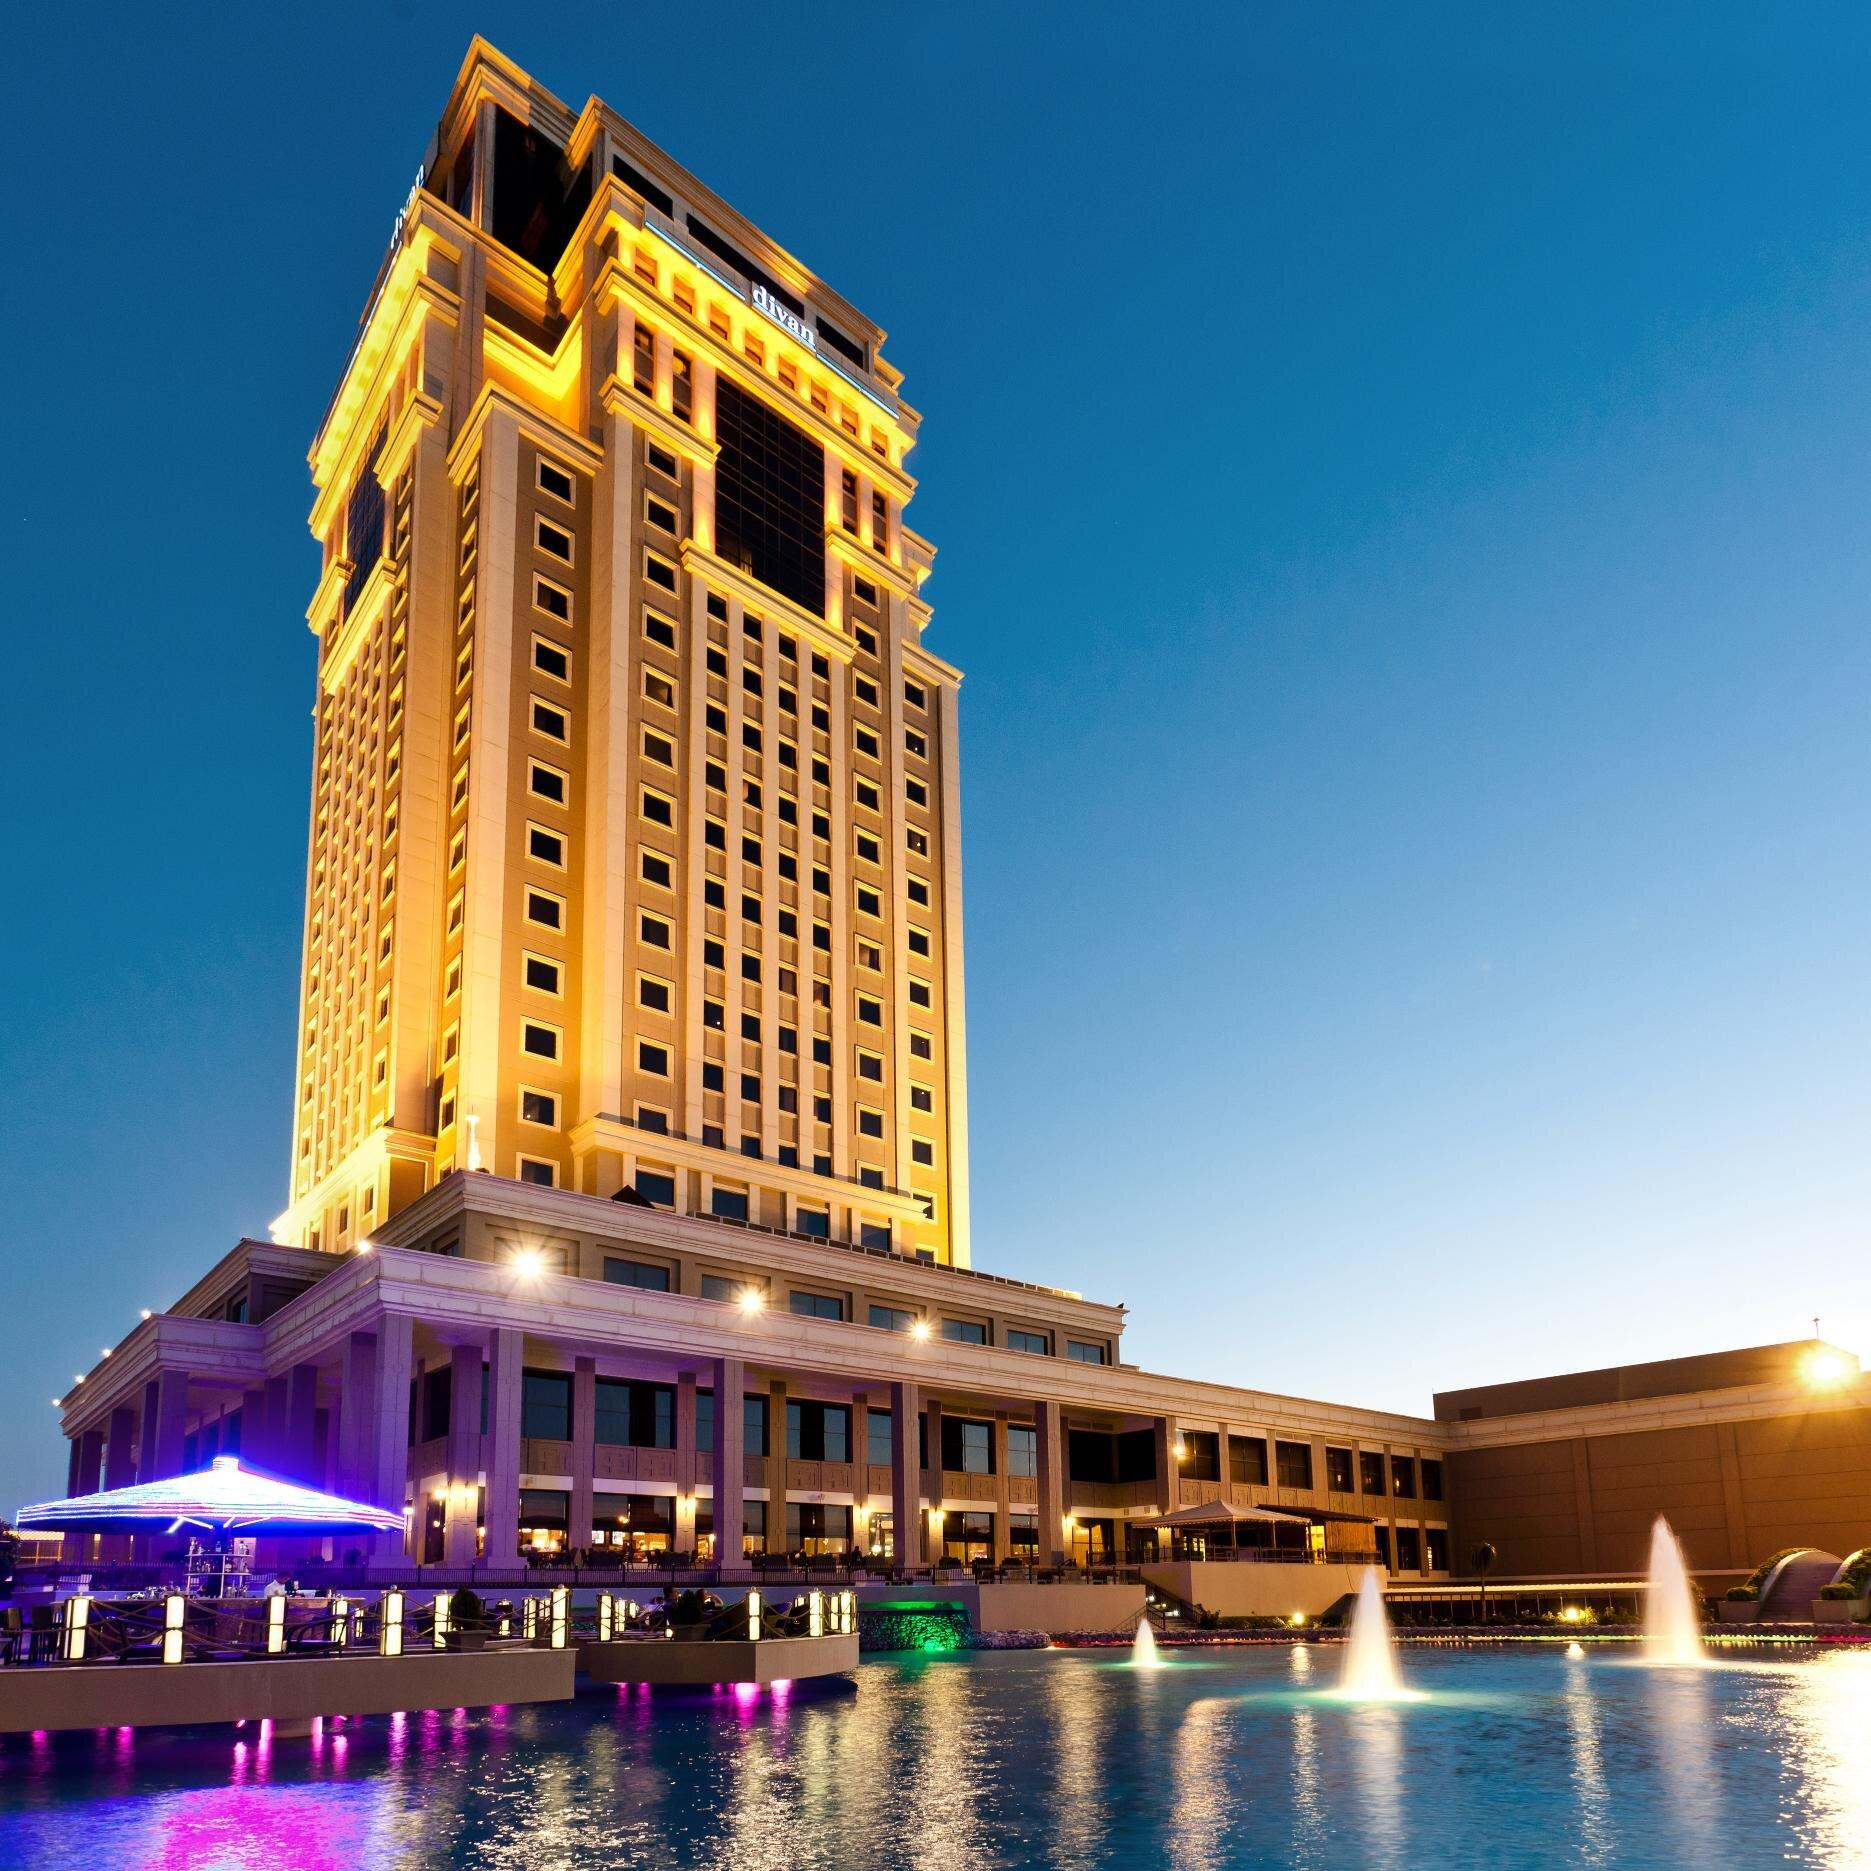 Divan hotel erbil divanhotelerbil twitter for Divan hotel erbil